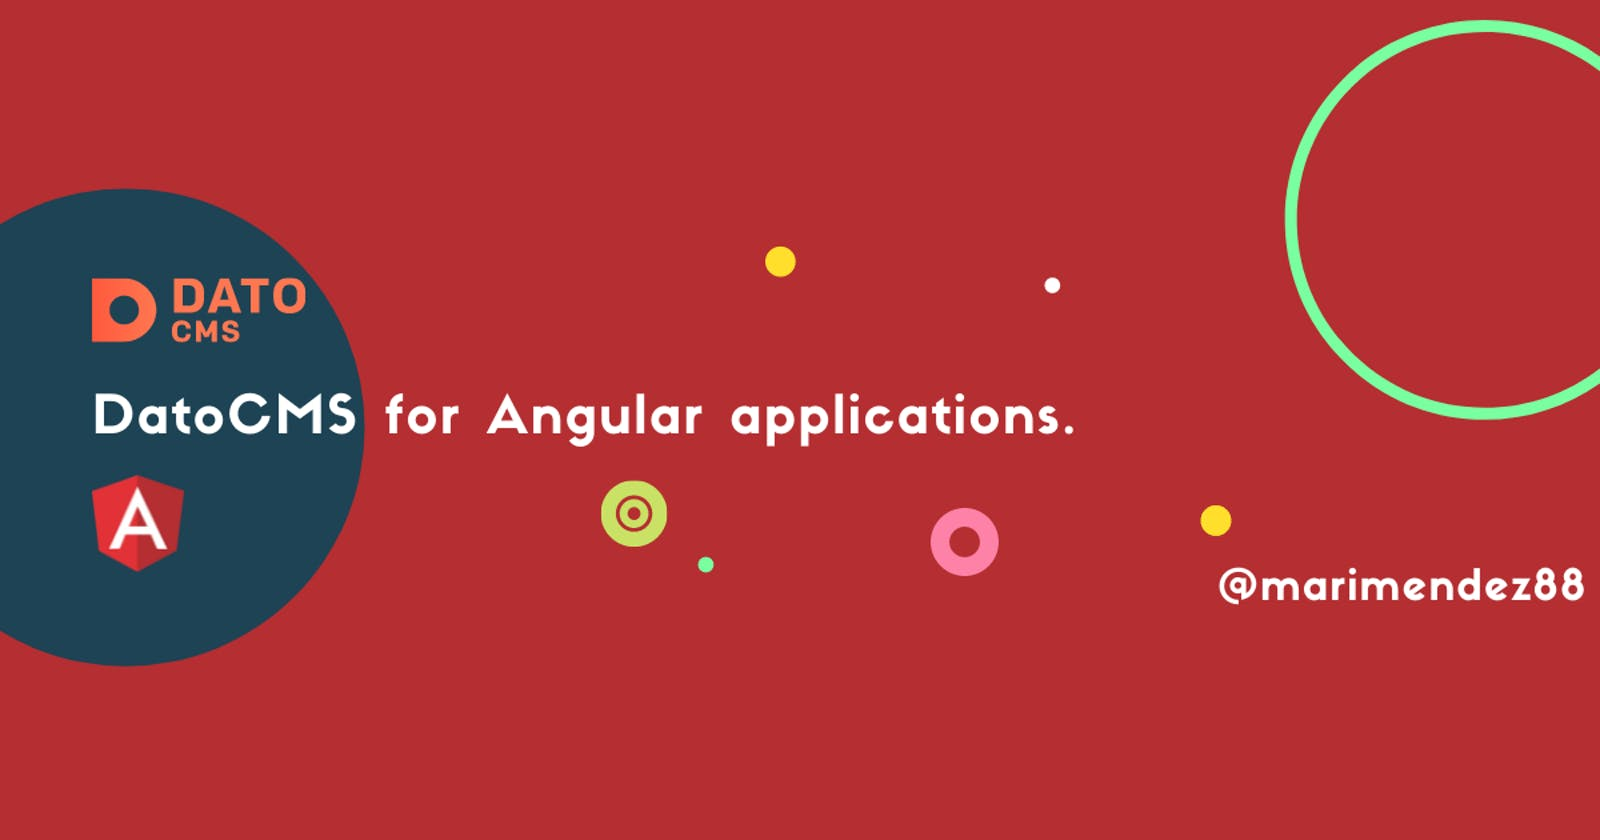 DatoCMS for Angular Applications